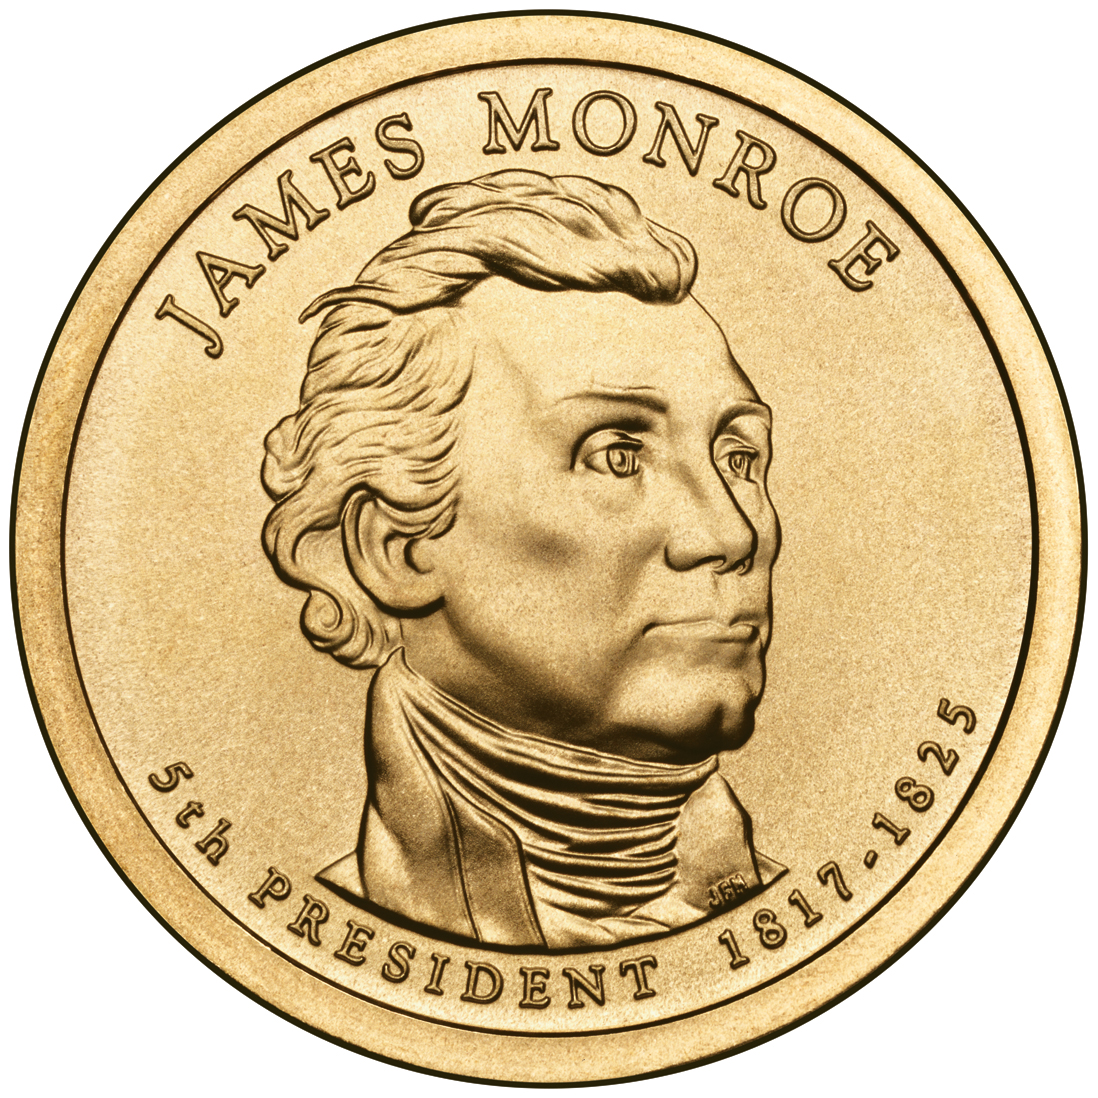 Monroe Doctrine Centennial half dollar - Wikipedia, the free ...